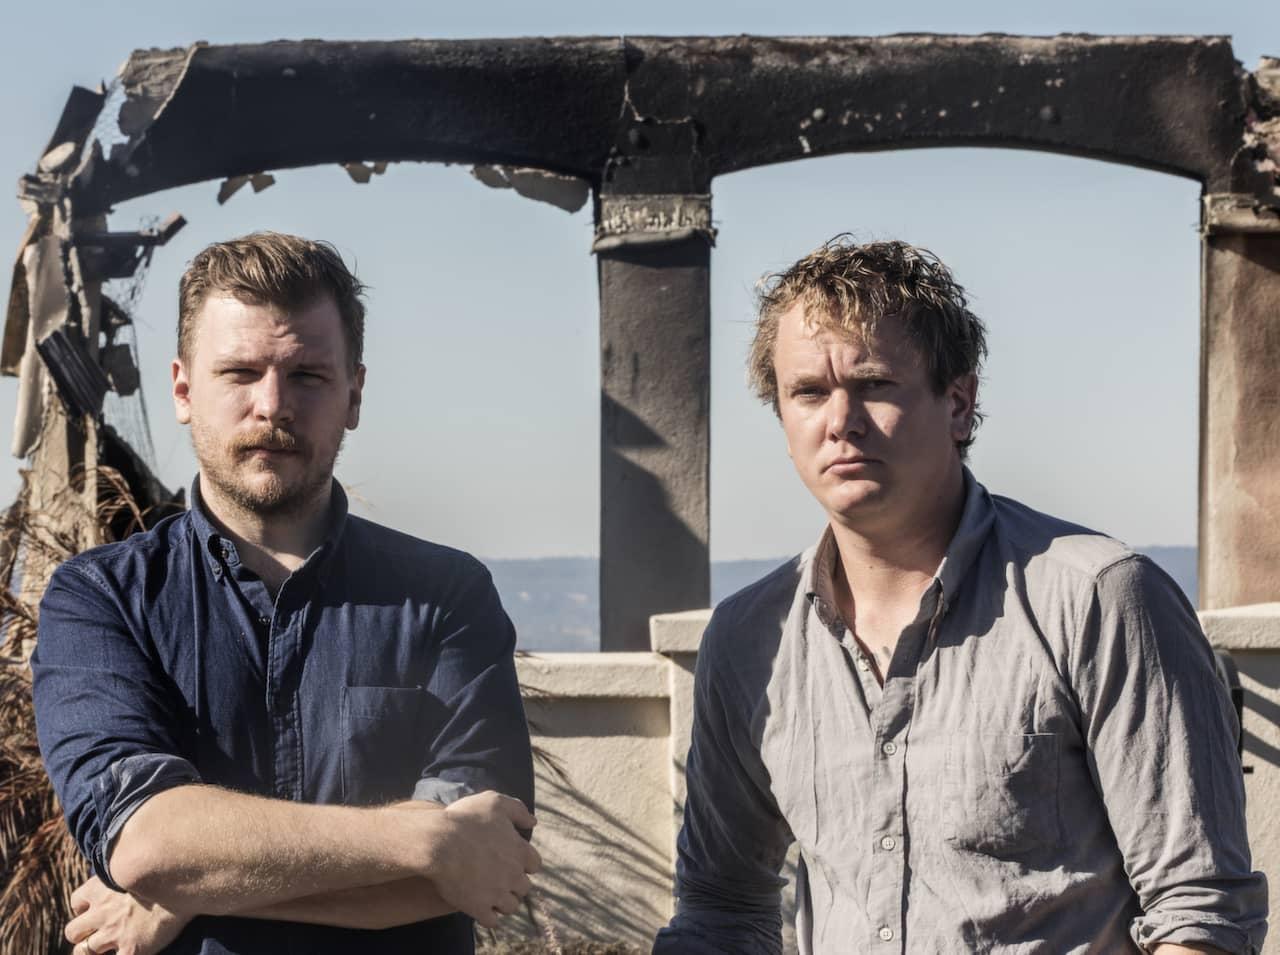 Anders Sandqvist & Axel Öberg